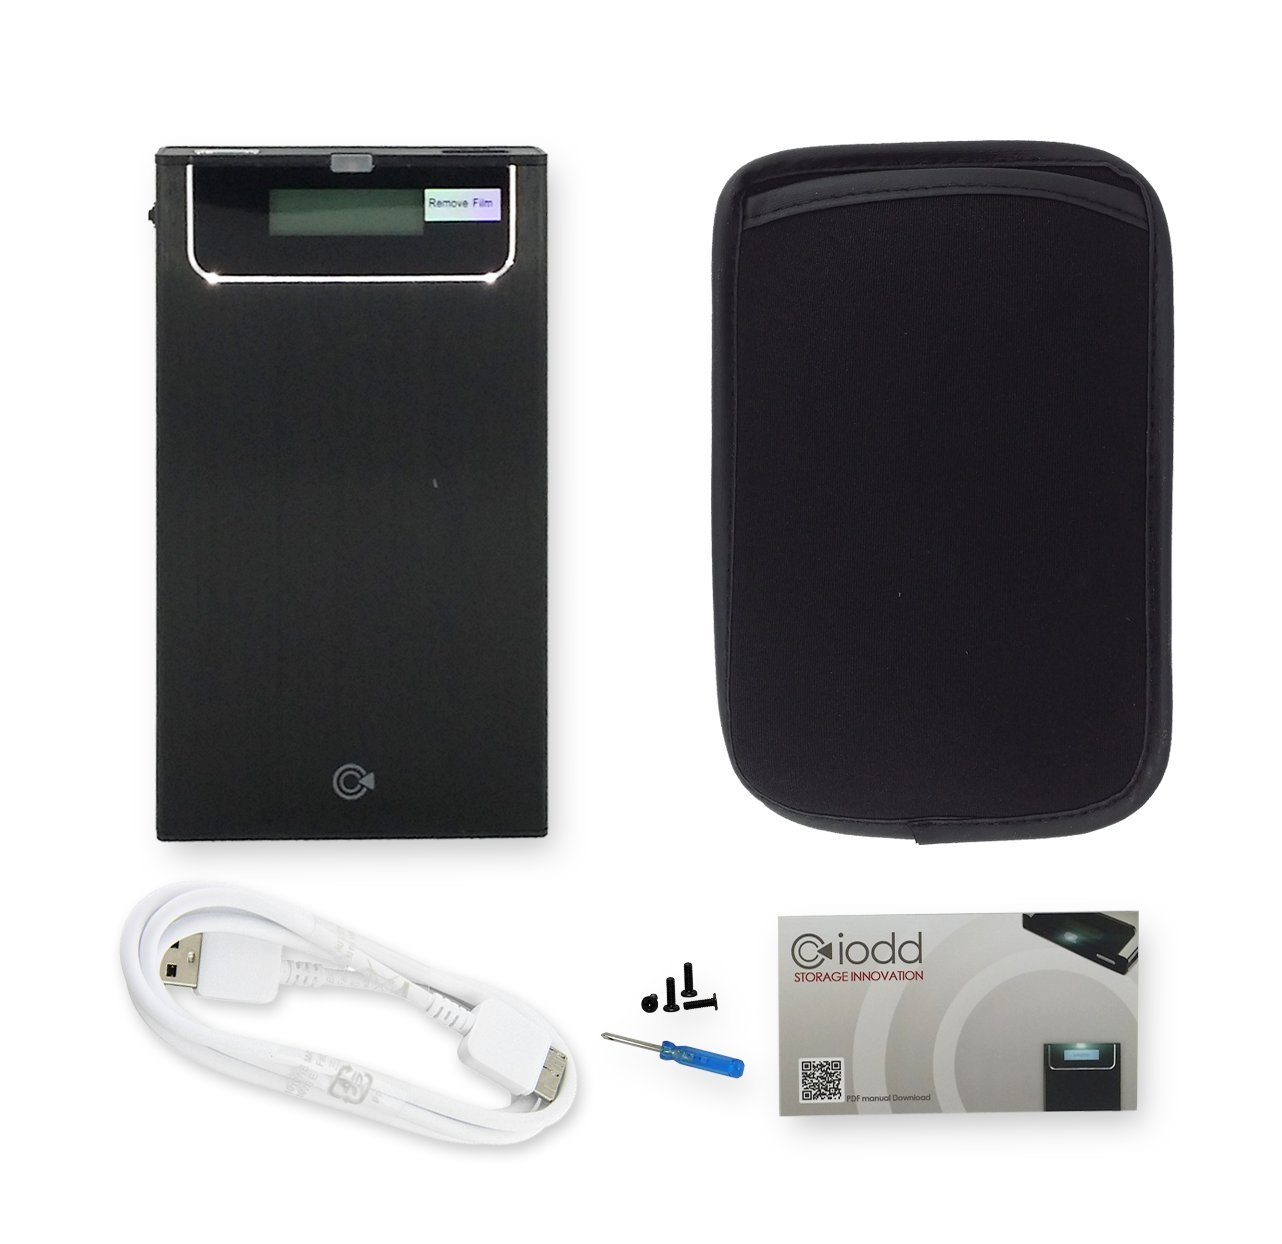 IODD 2531 Negro USB 3.0 External Hard Drive Enclosure [virtual de DVD Blu-ray ROM / VHD / arranque / SSD / HDD / 2.5] Hecho en Corea (IVA no incluido): ...